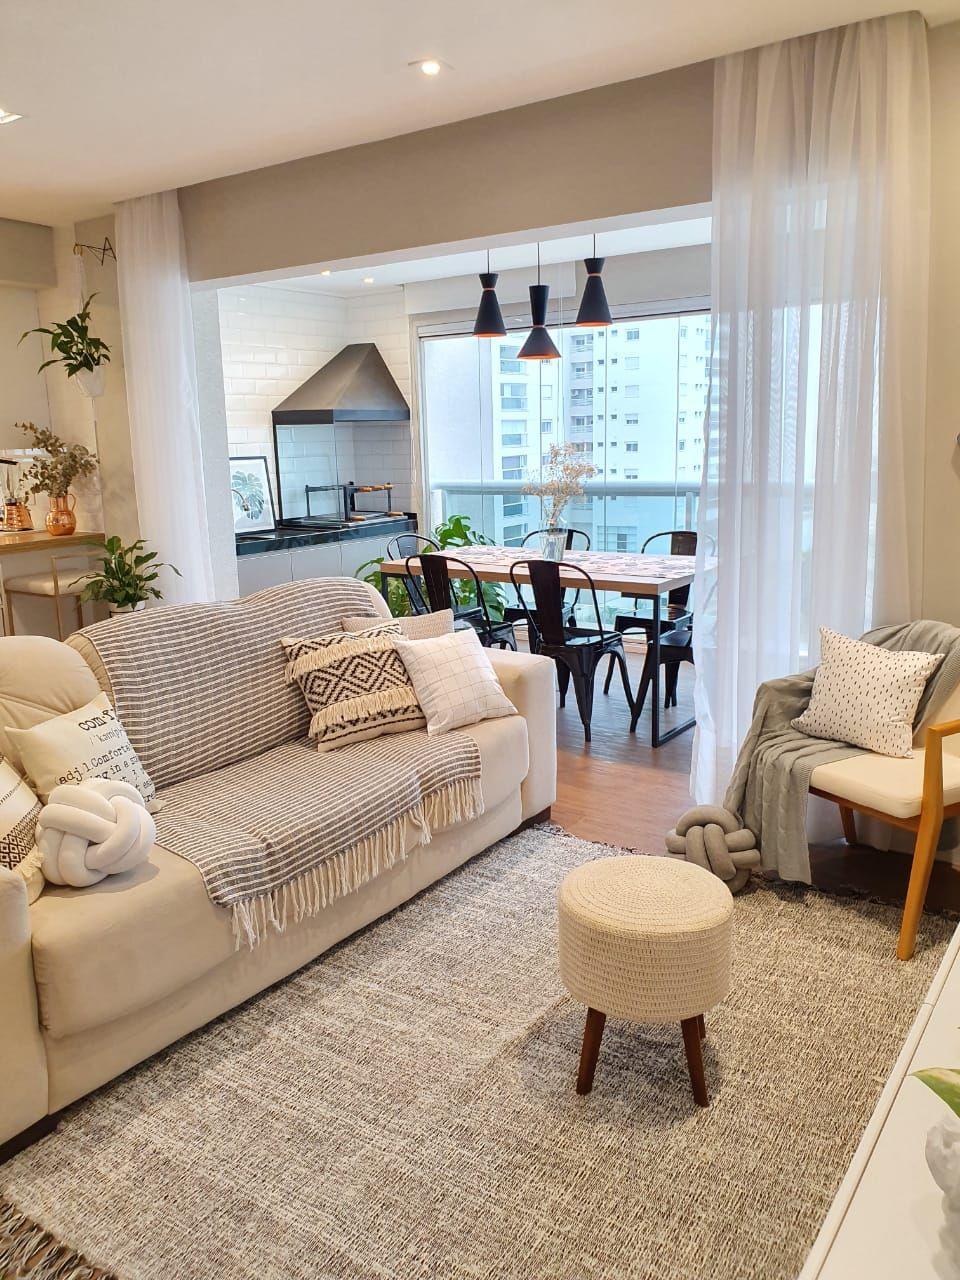 Tapete Para Sala Rustic Liso Tapetearte Em 2020 Decoracao Com Tapetes Tapete Sala De Jantar Decoracao Sala Apartamento